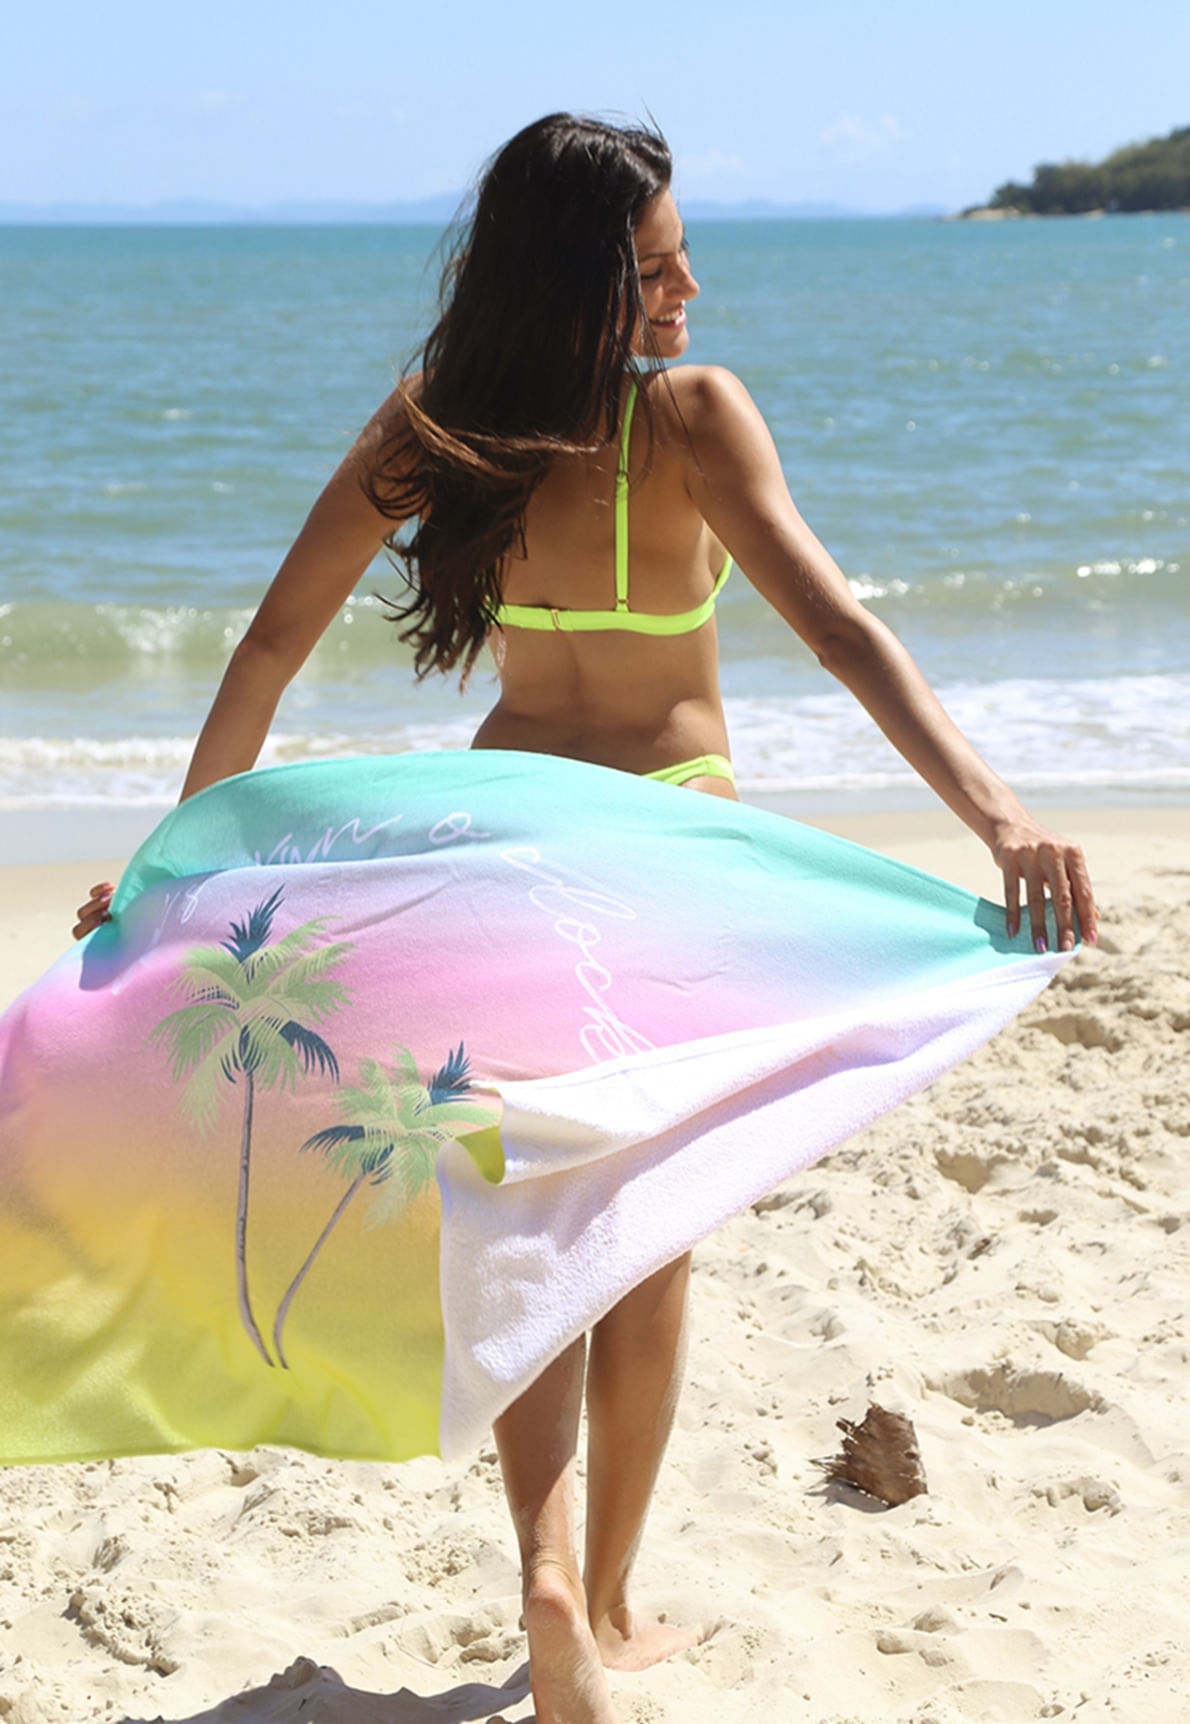 29903-toalha-de-praia-its-tan-oclock-mundo-lolita-04